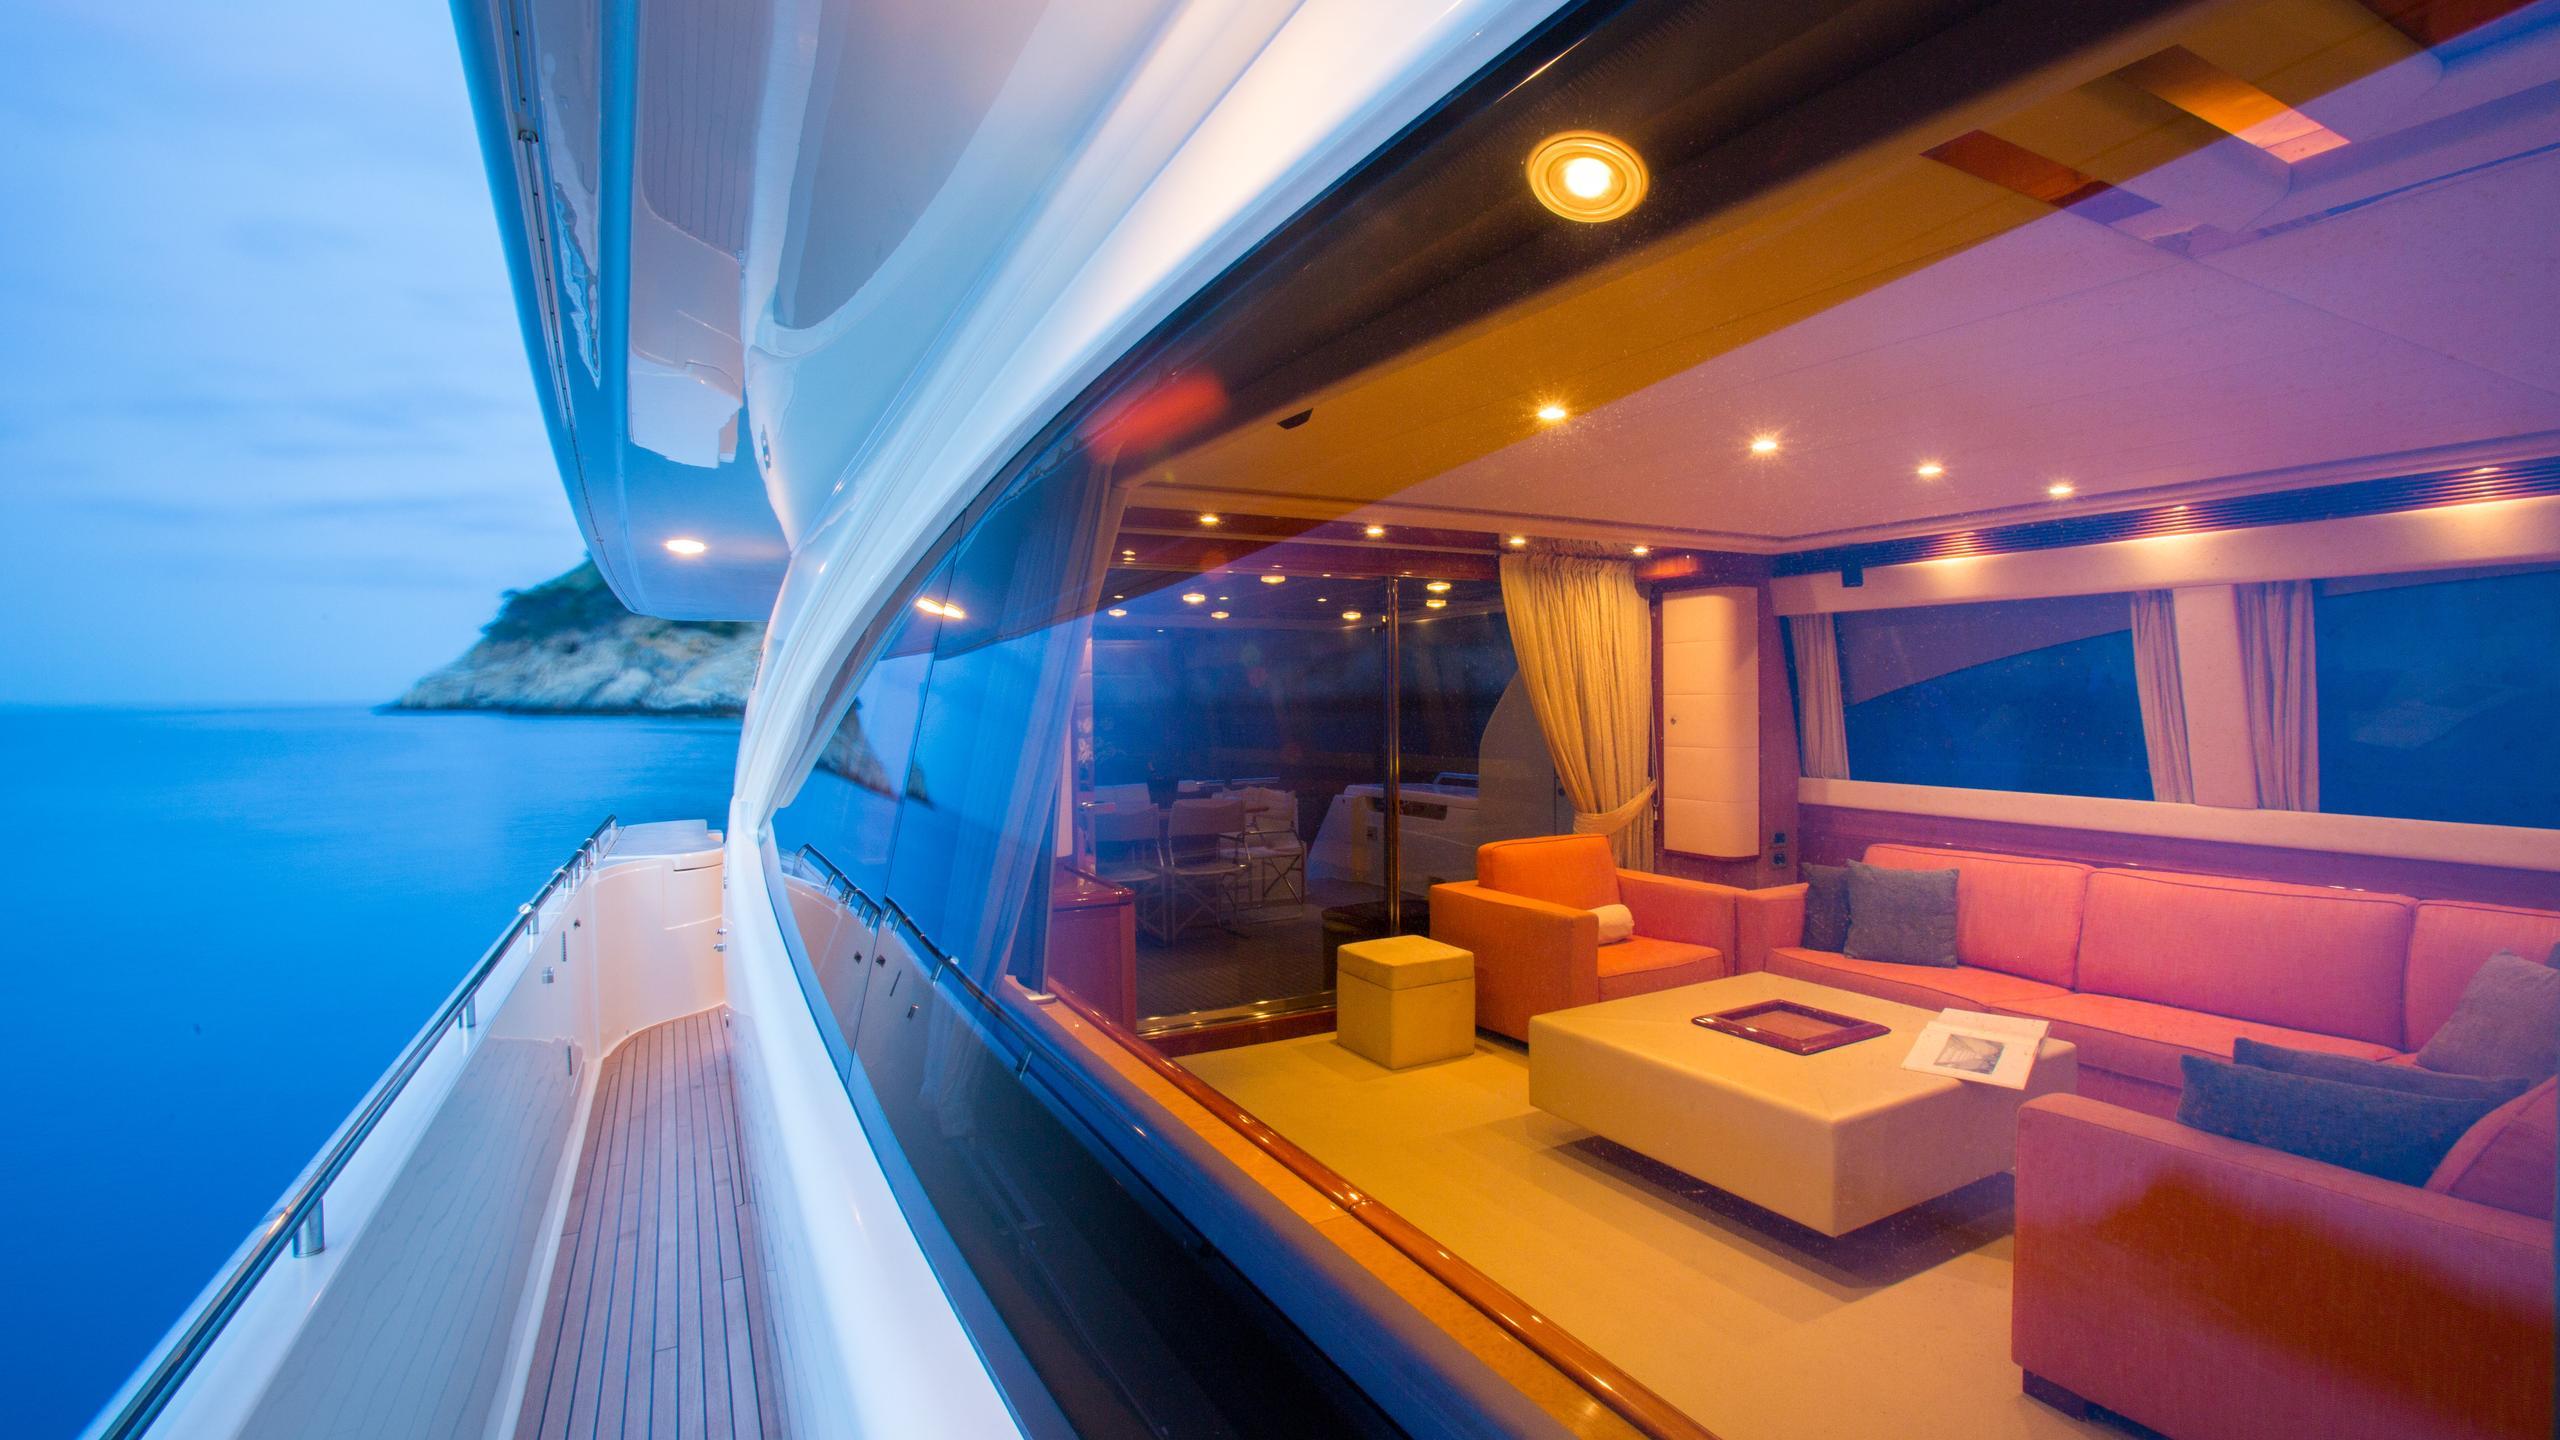 monticello-ii-yacht-side-deck